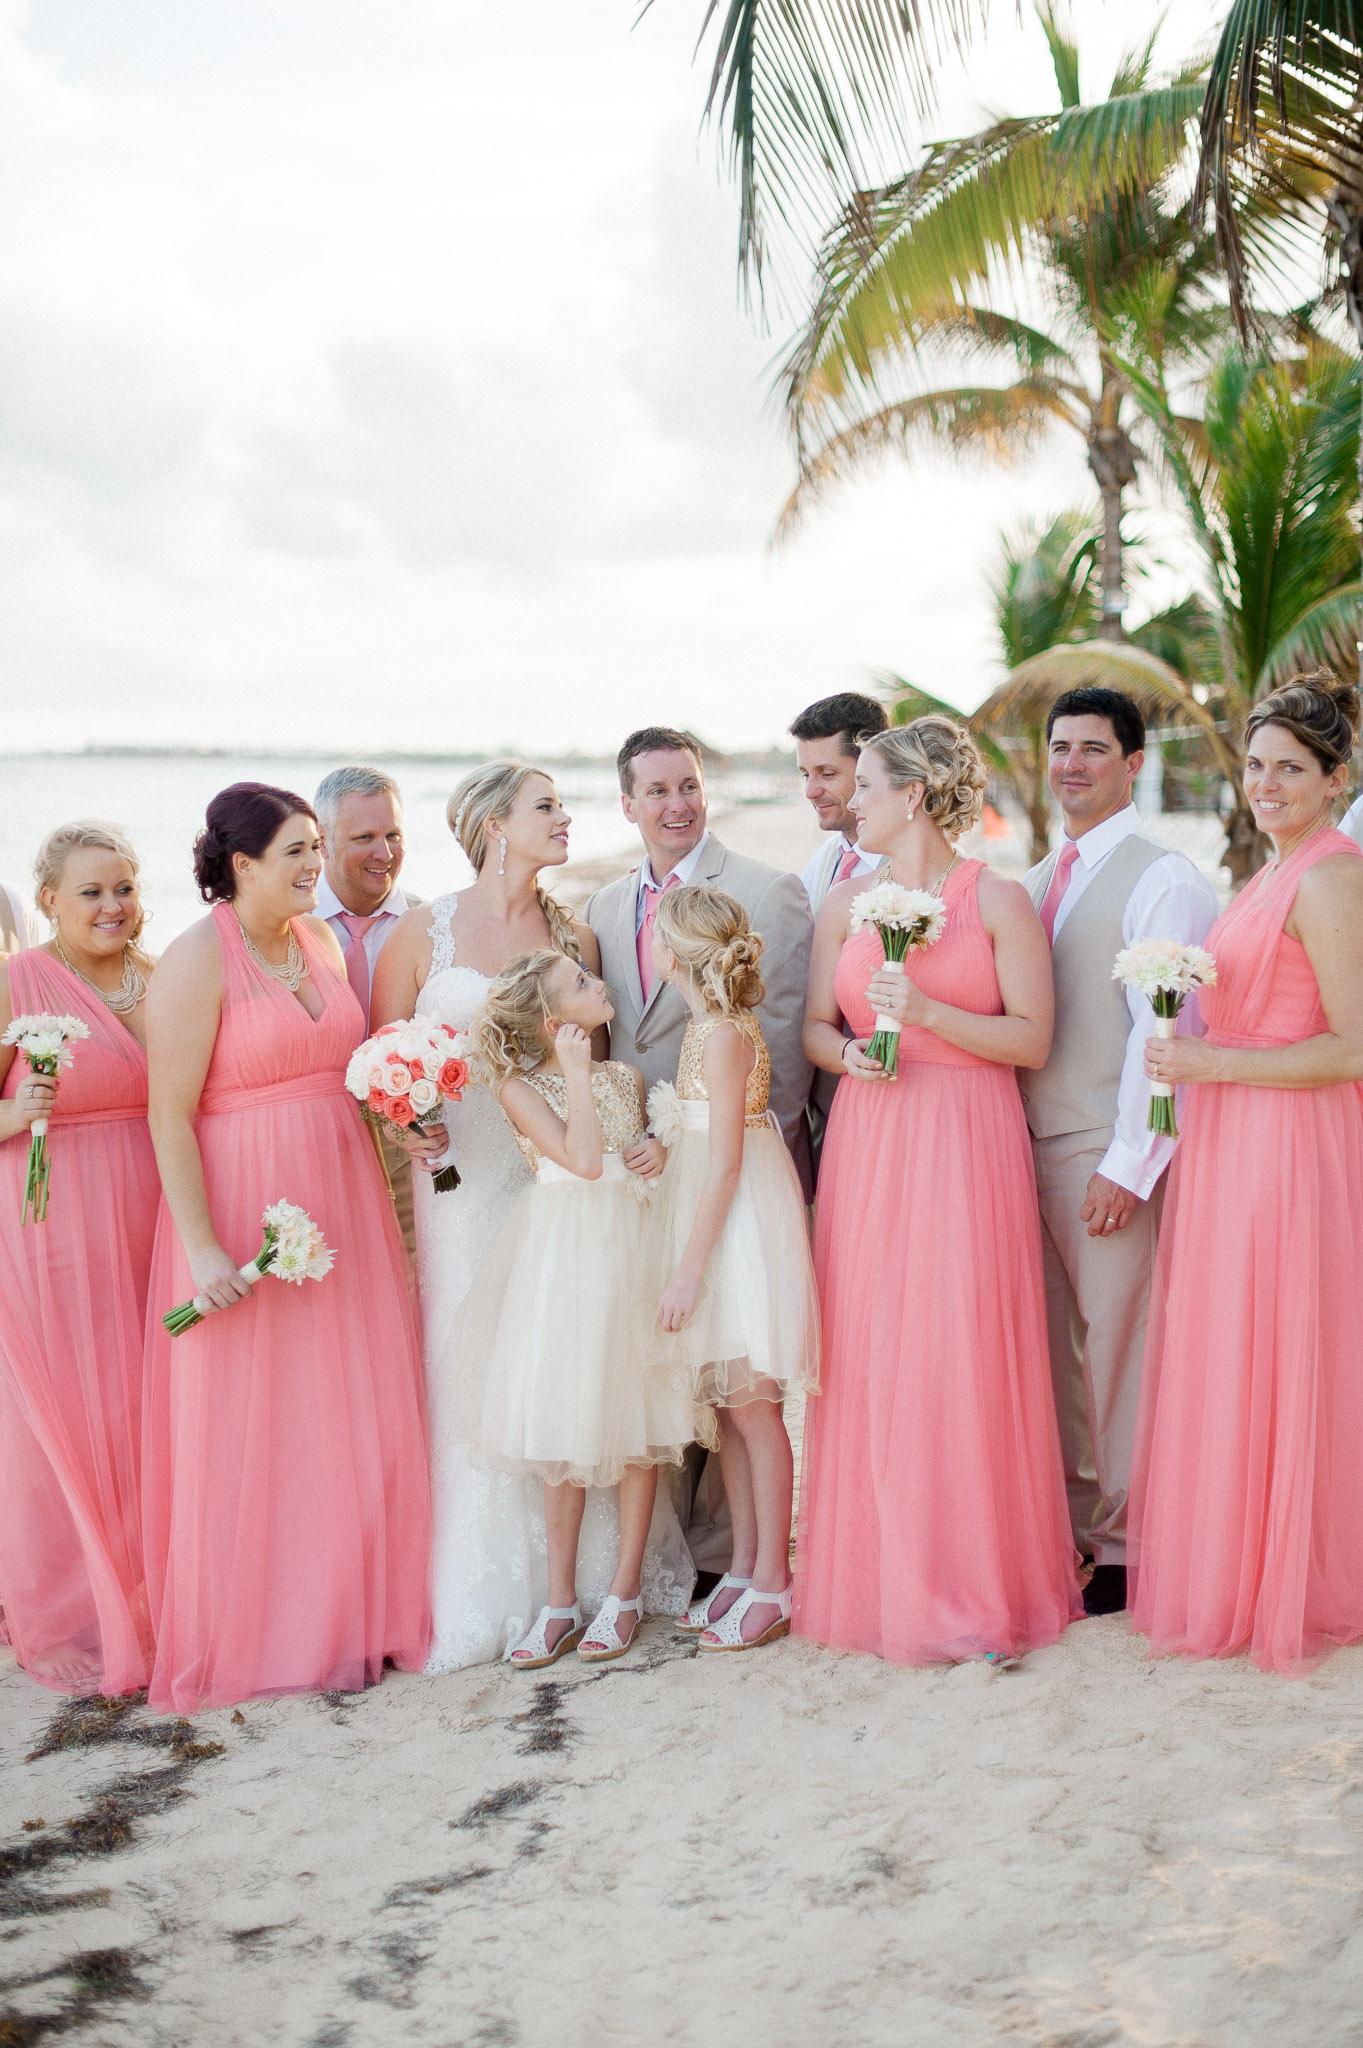 Megan and Chris wedding-43.jpg